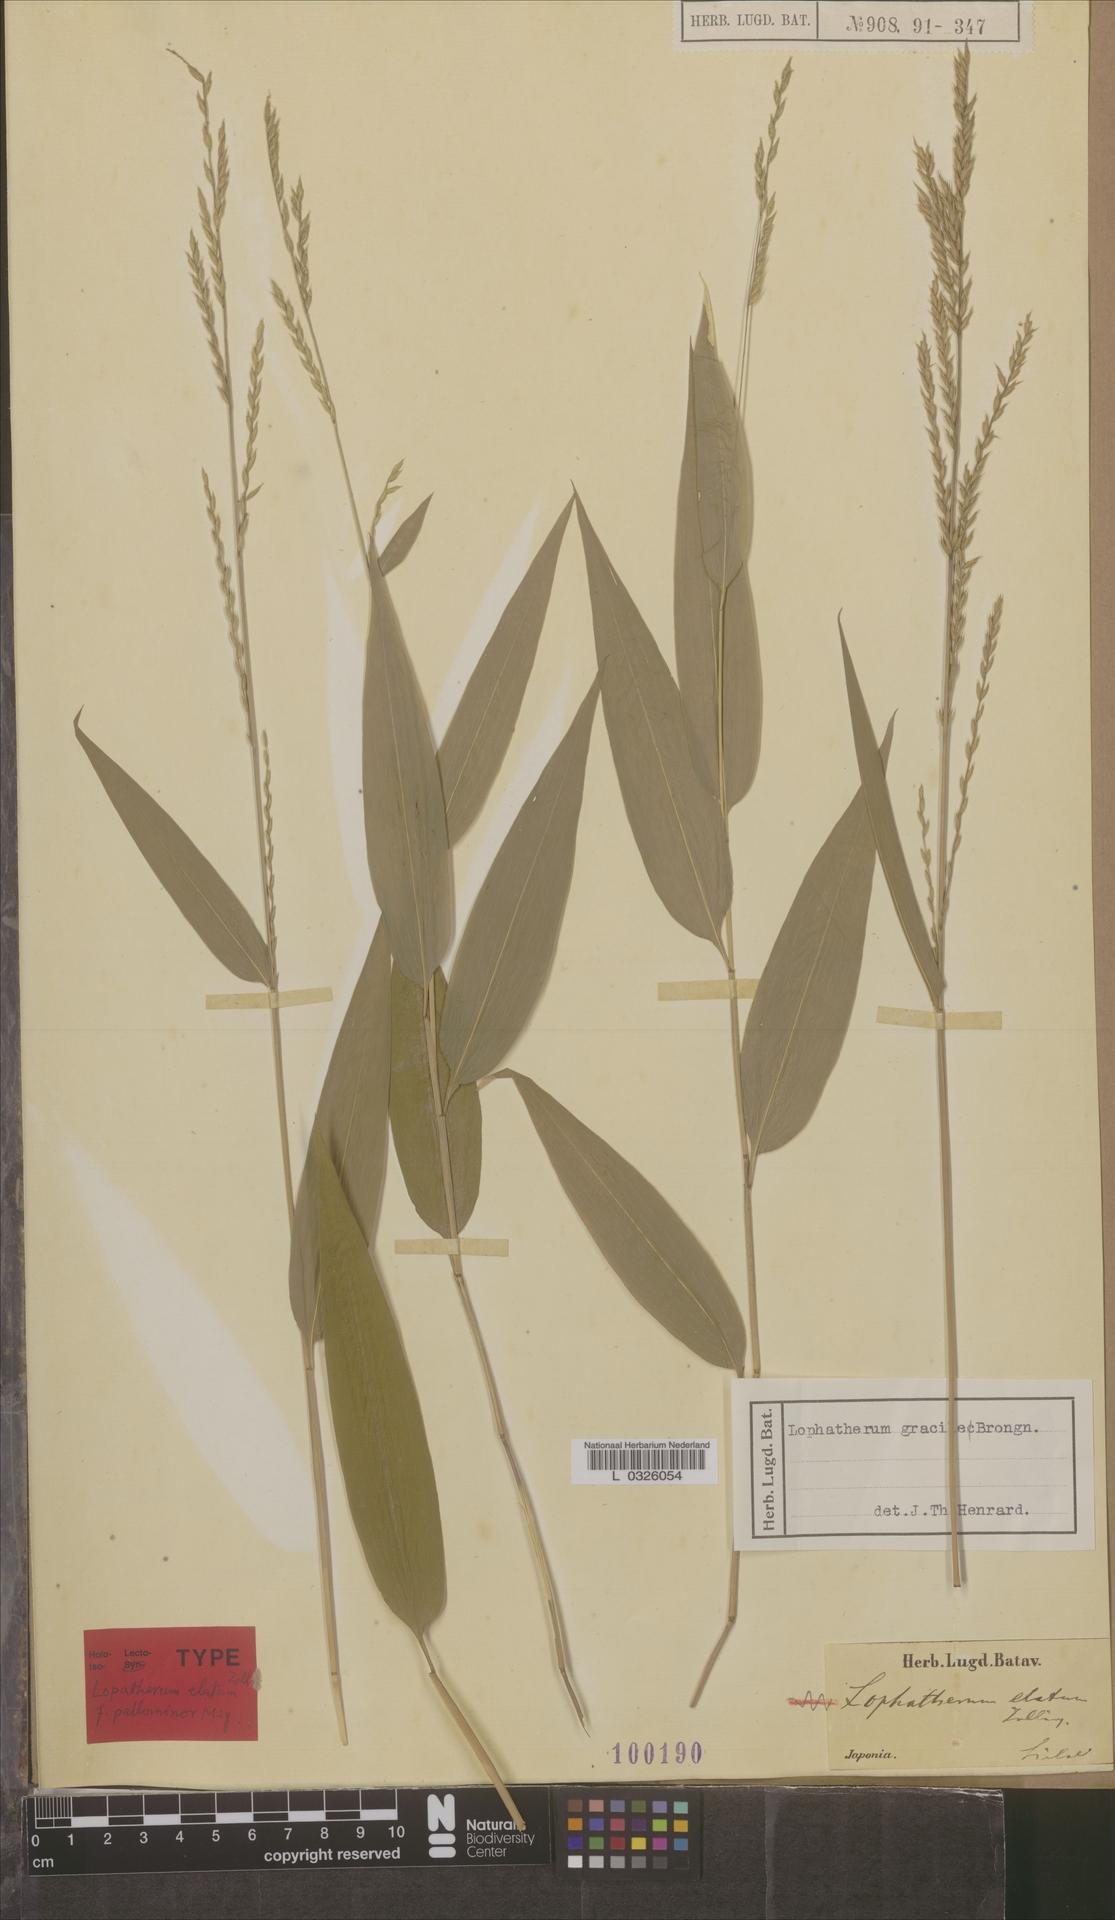 L  0326054 | Lophatherum gracile Brongn.